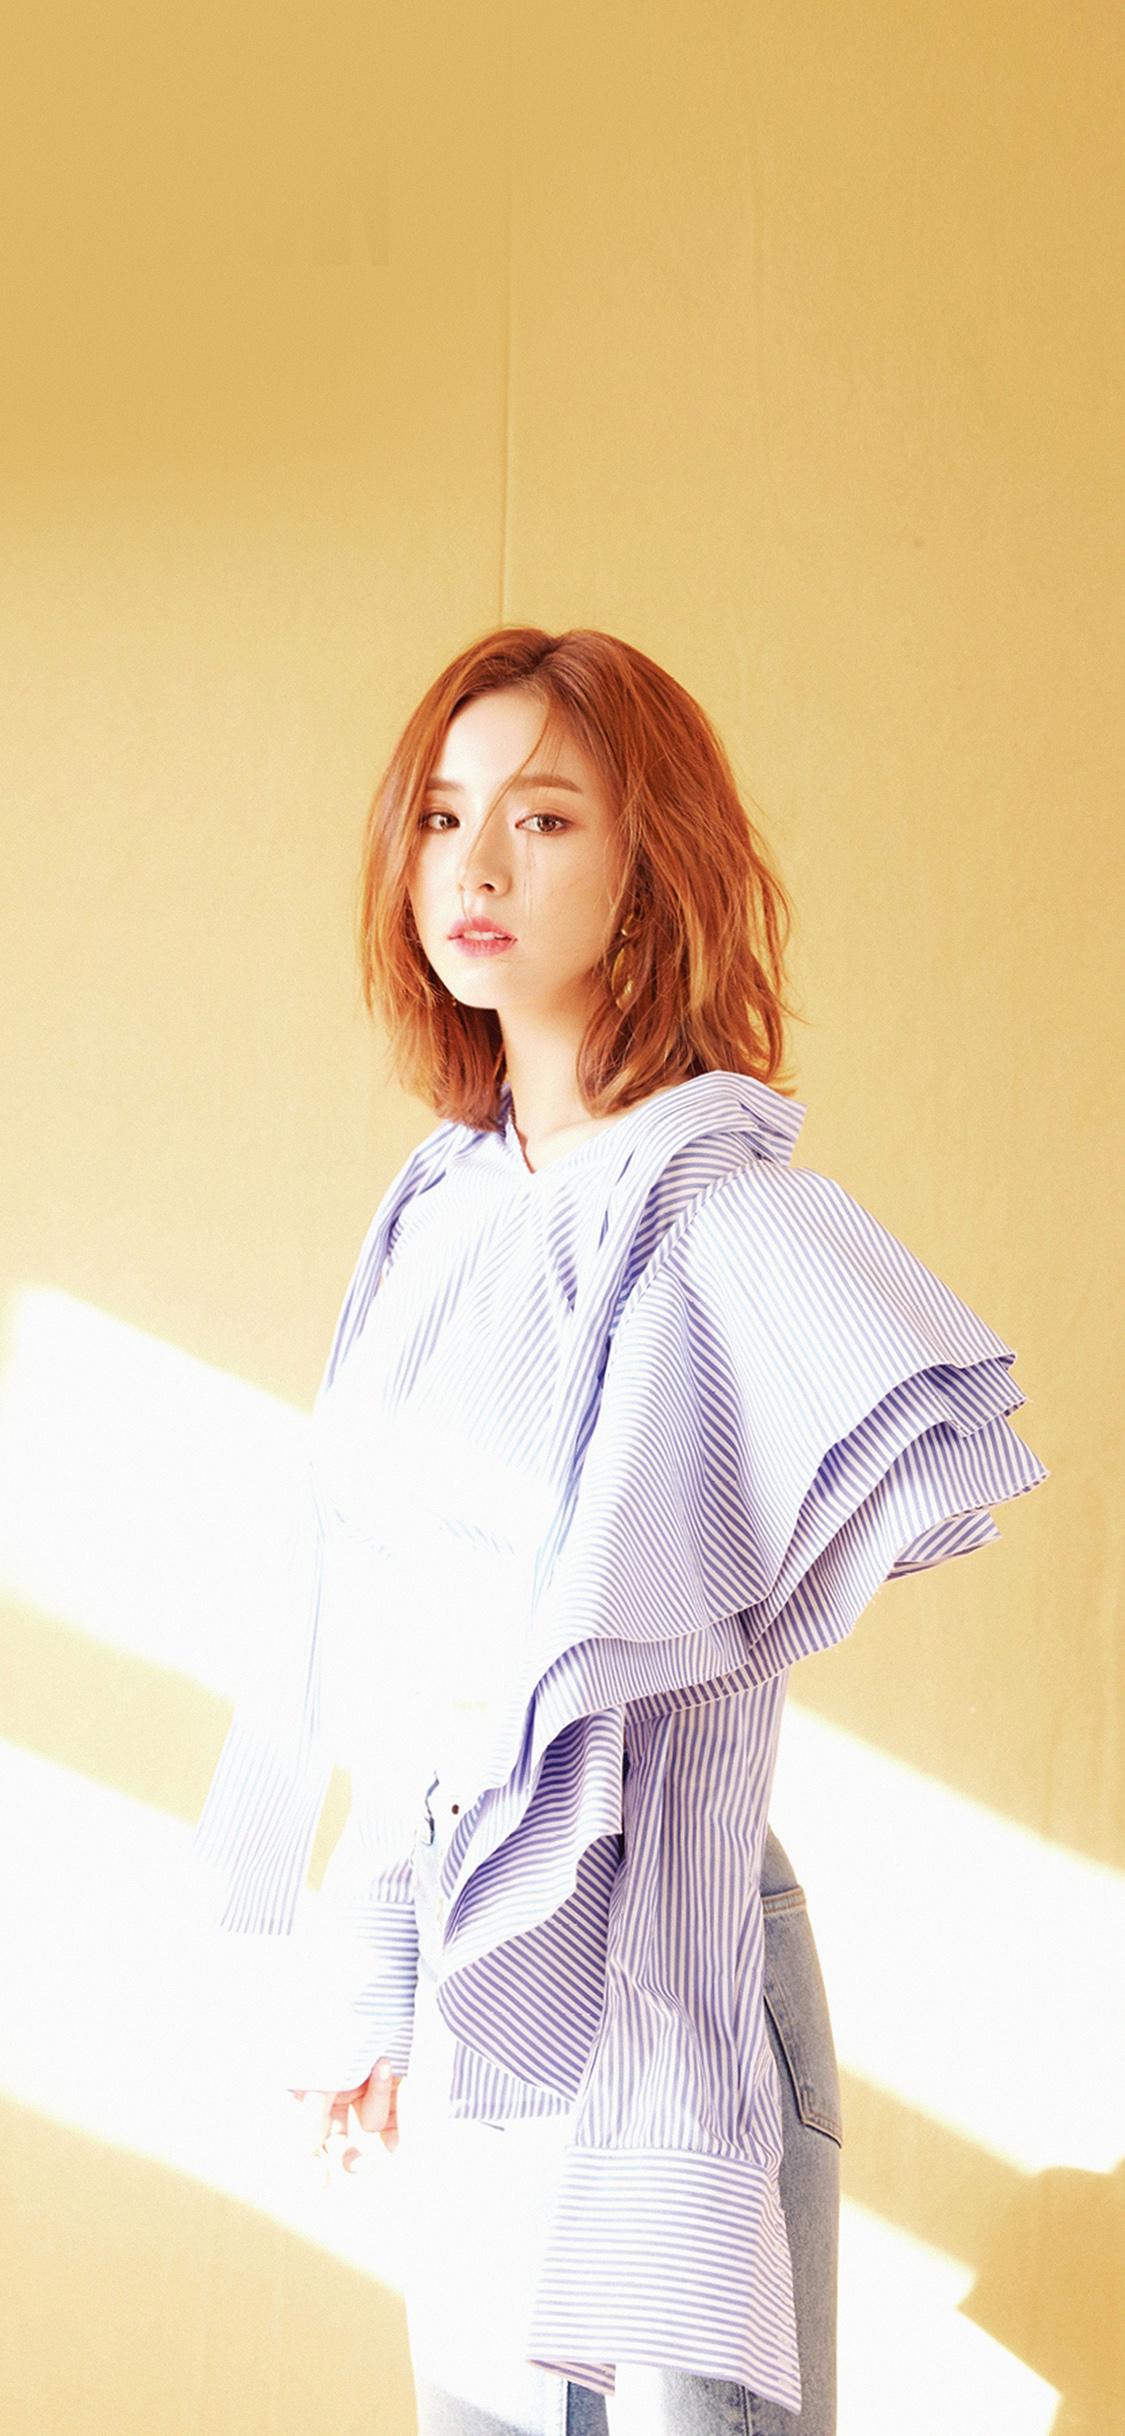 Asian Girl Wallpapers Ho19 Girl Korean Asian Cute Wallpaper